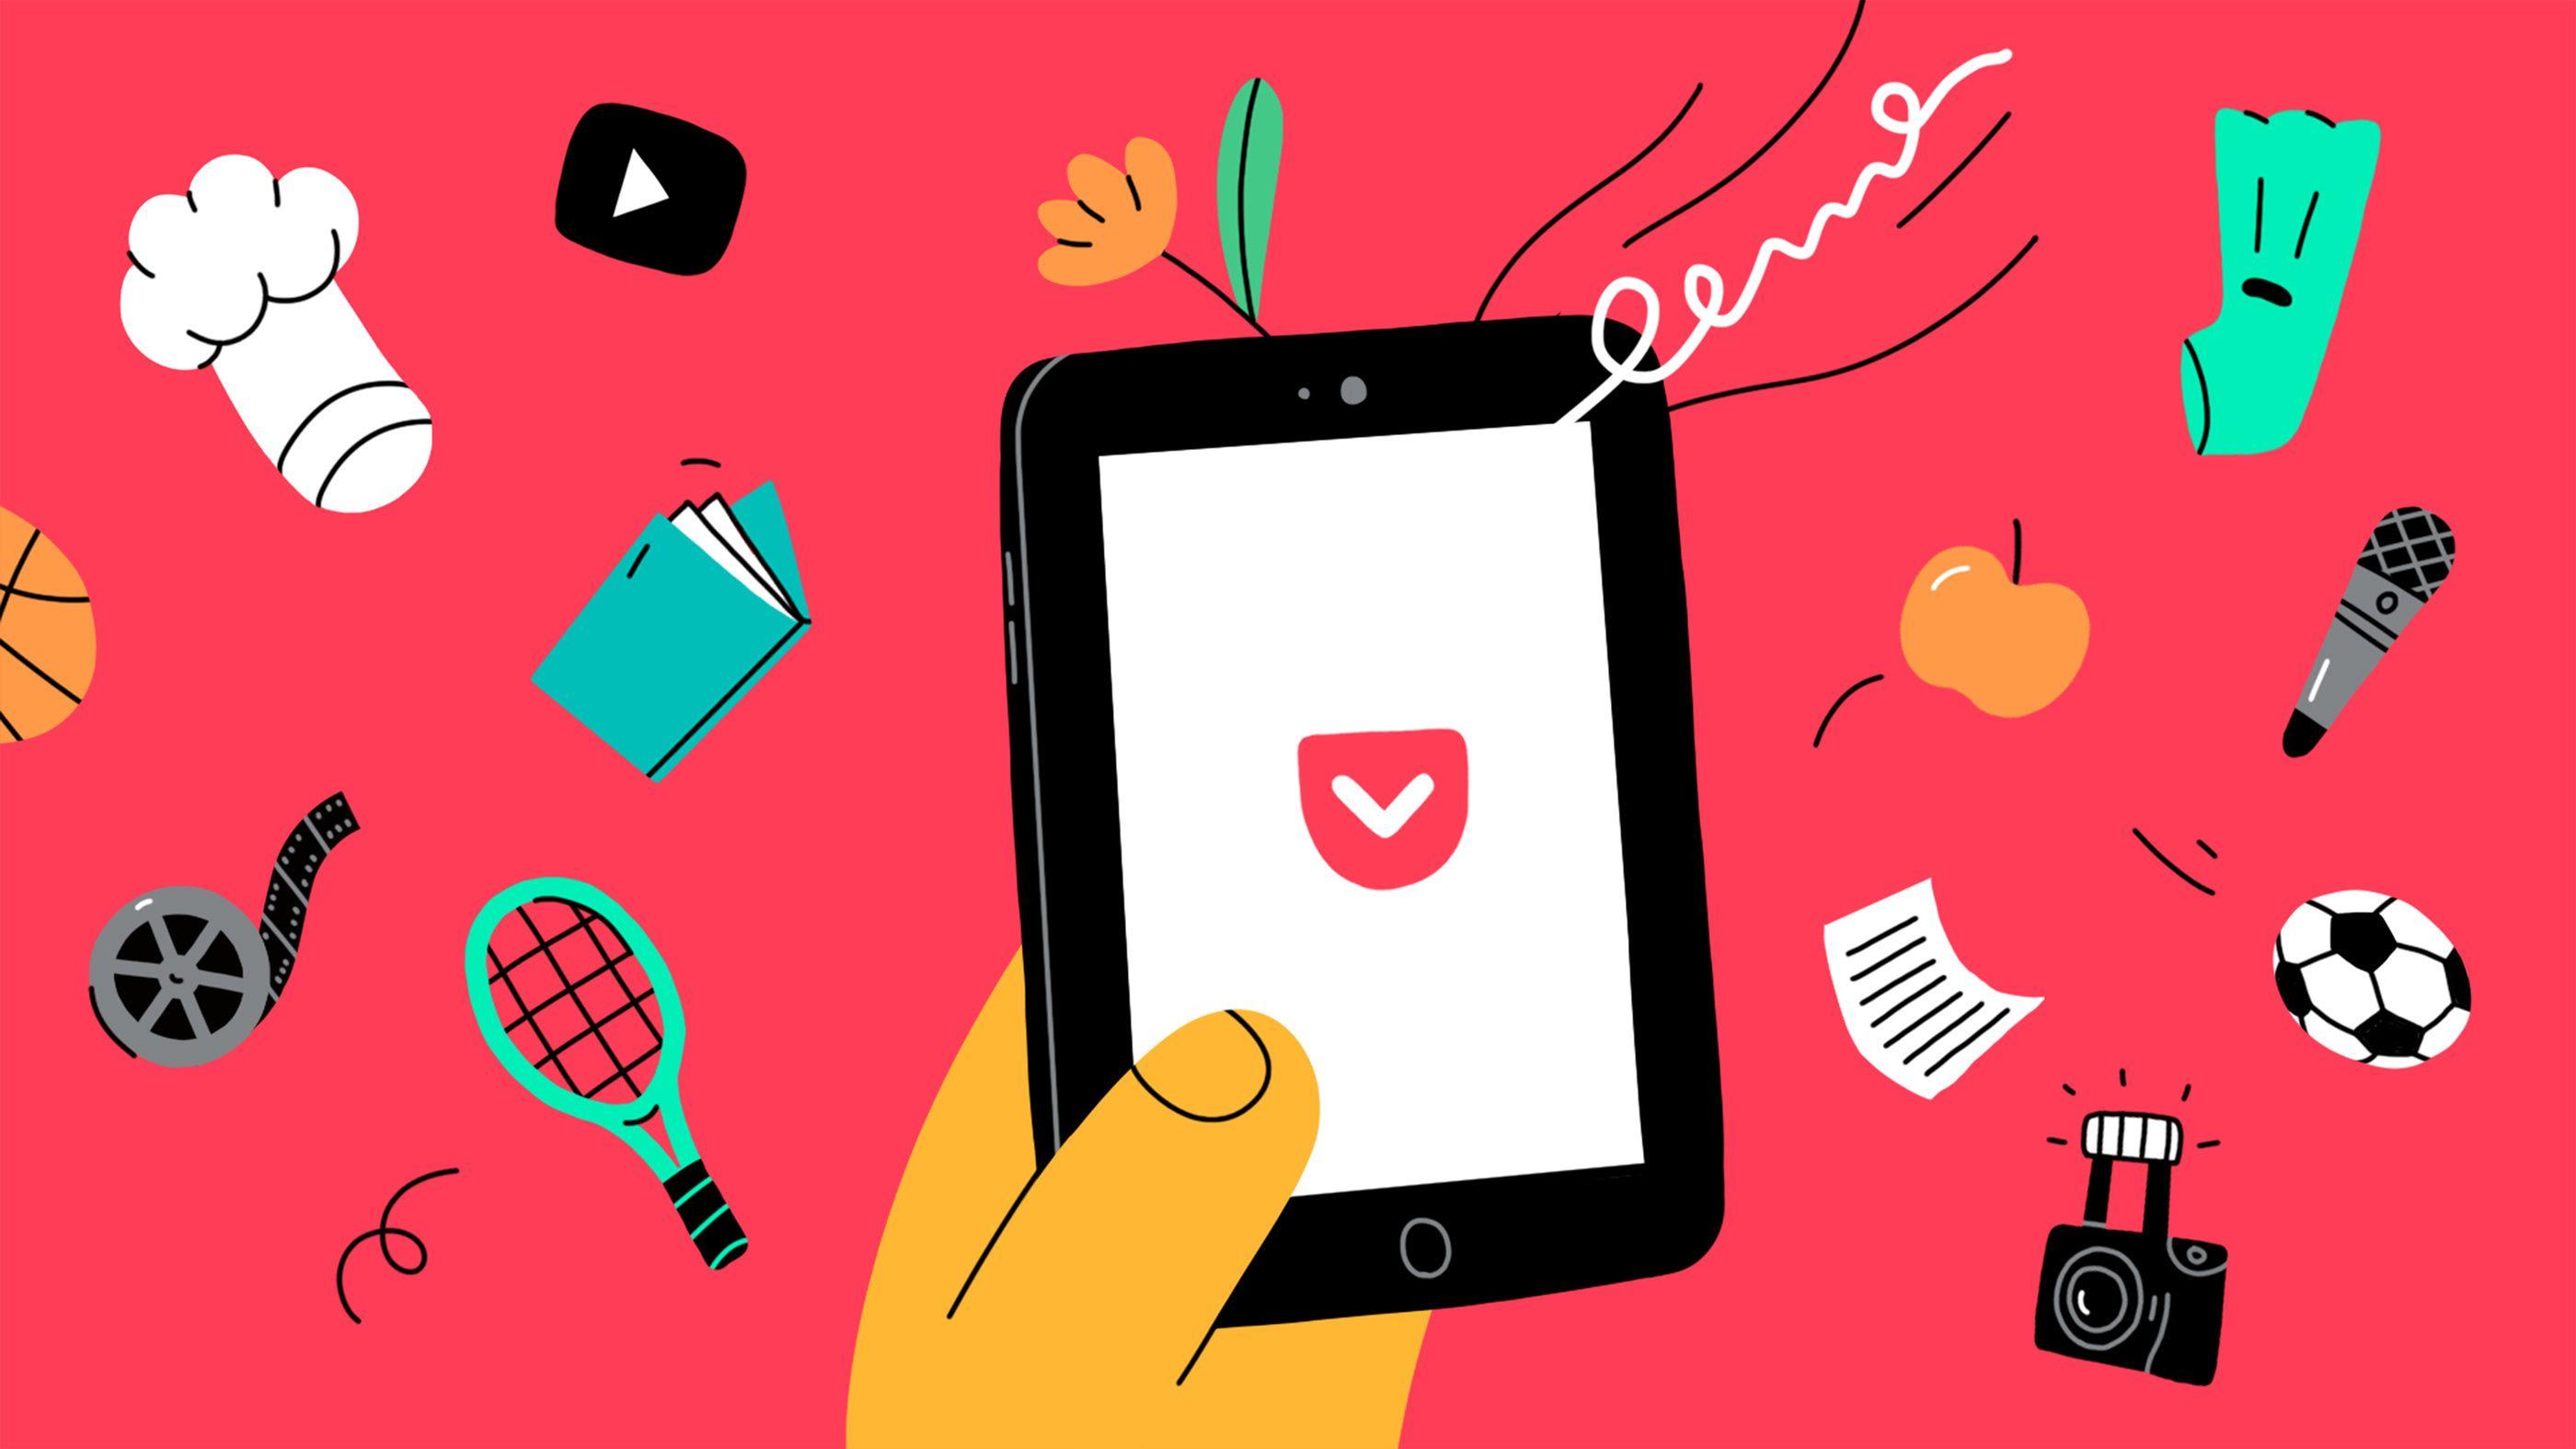 Animations for Pocket App on Behance Pocket app